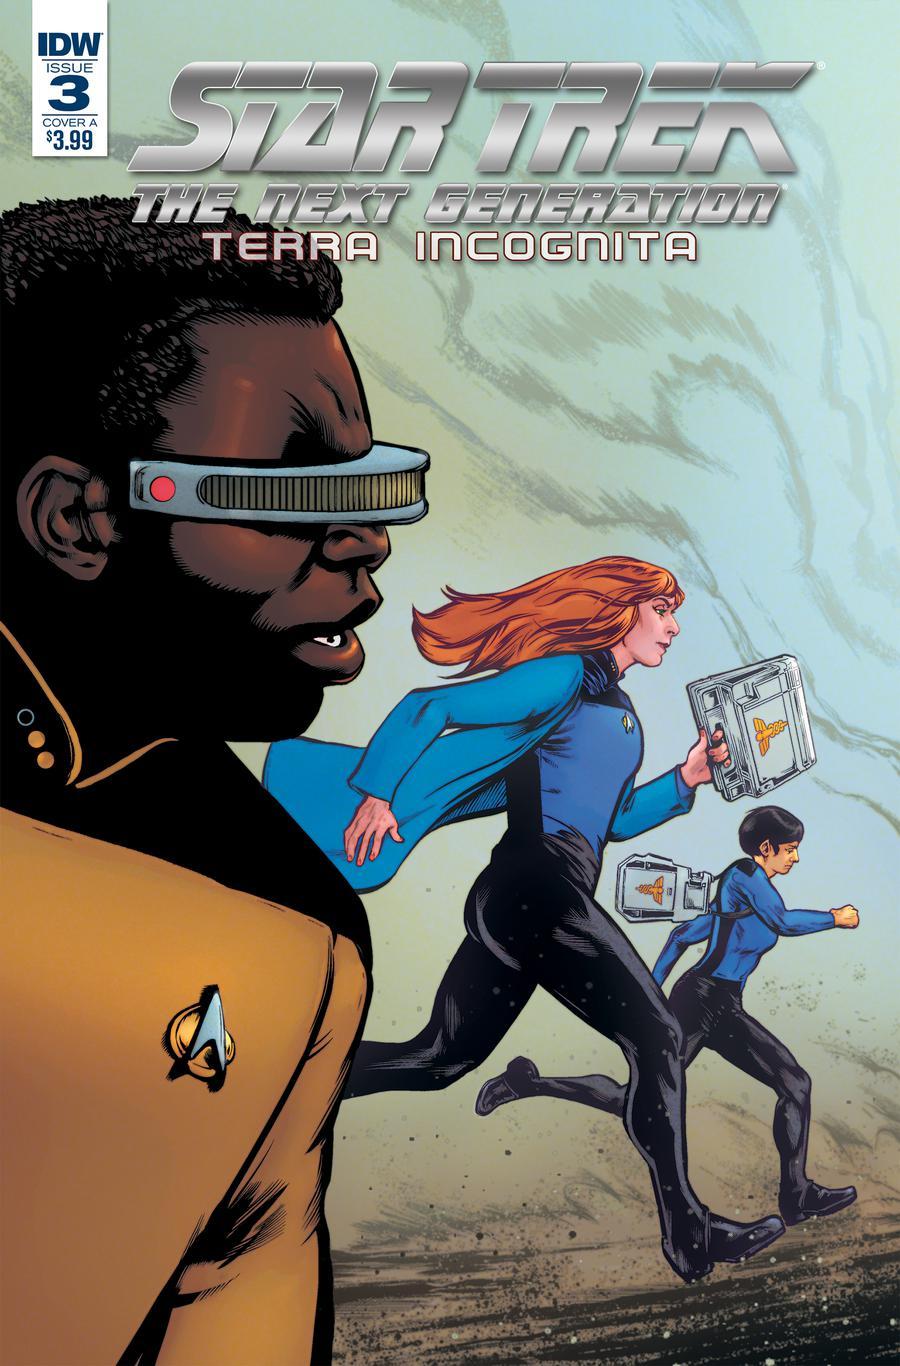 Star Trek The Next Generation Terra Incognita #3 Cover A Regular Tony Shasteen Cover